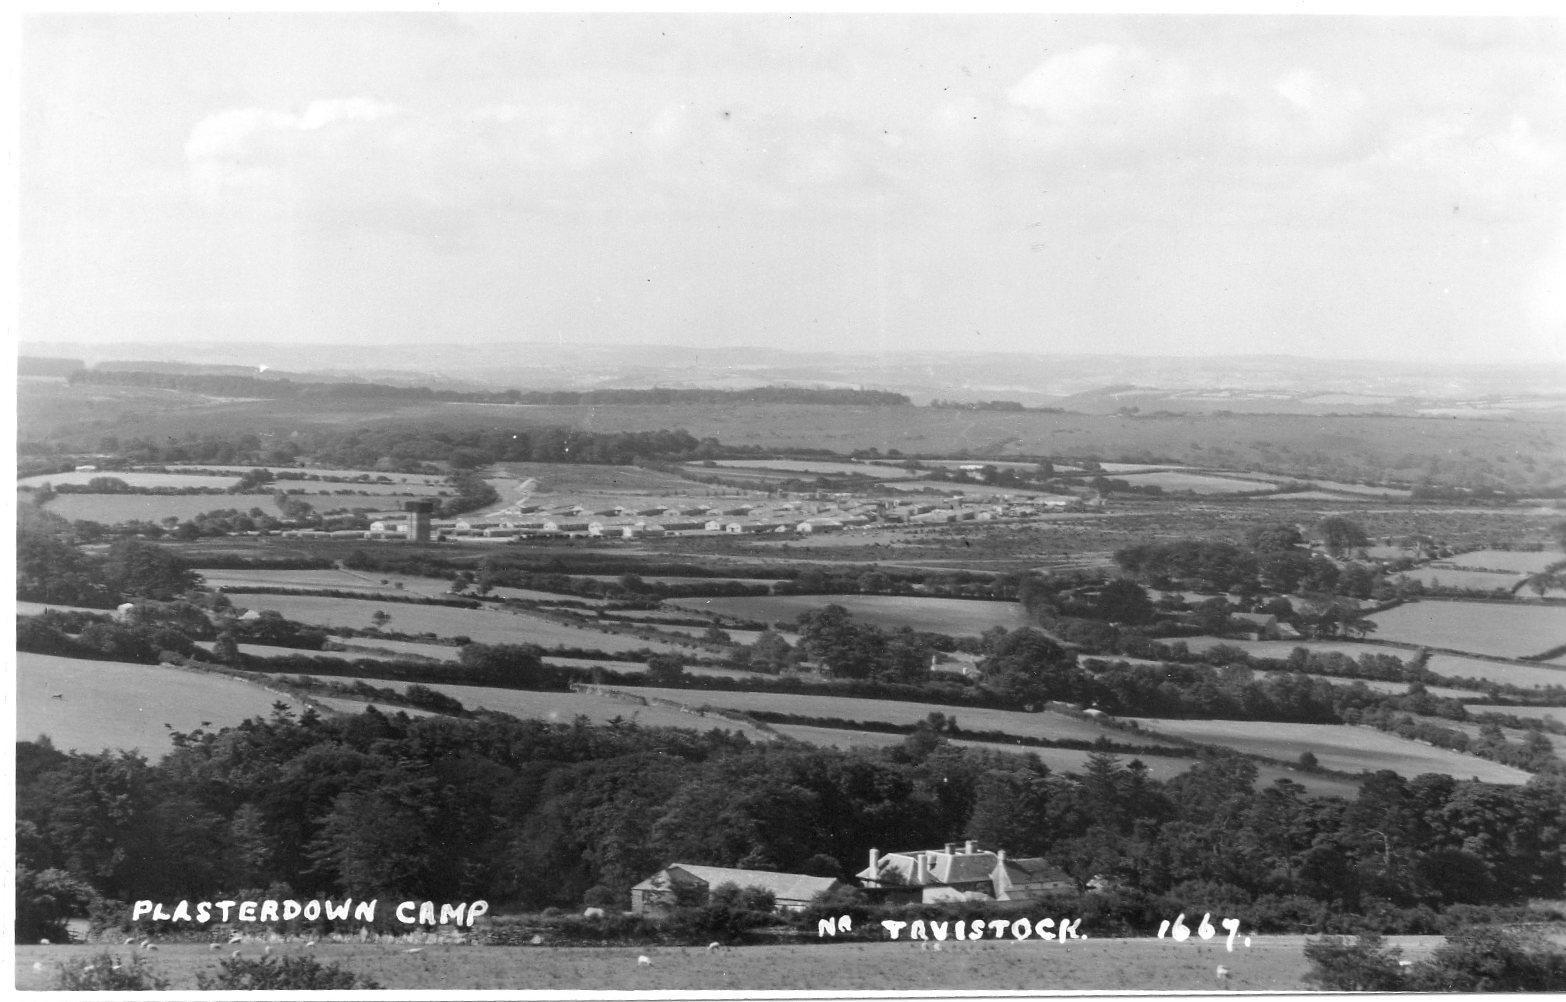 Plasterdown Camp Nr. Tavistock 1667